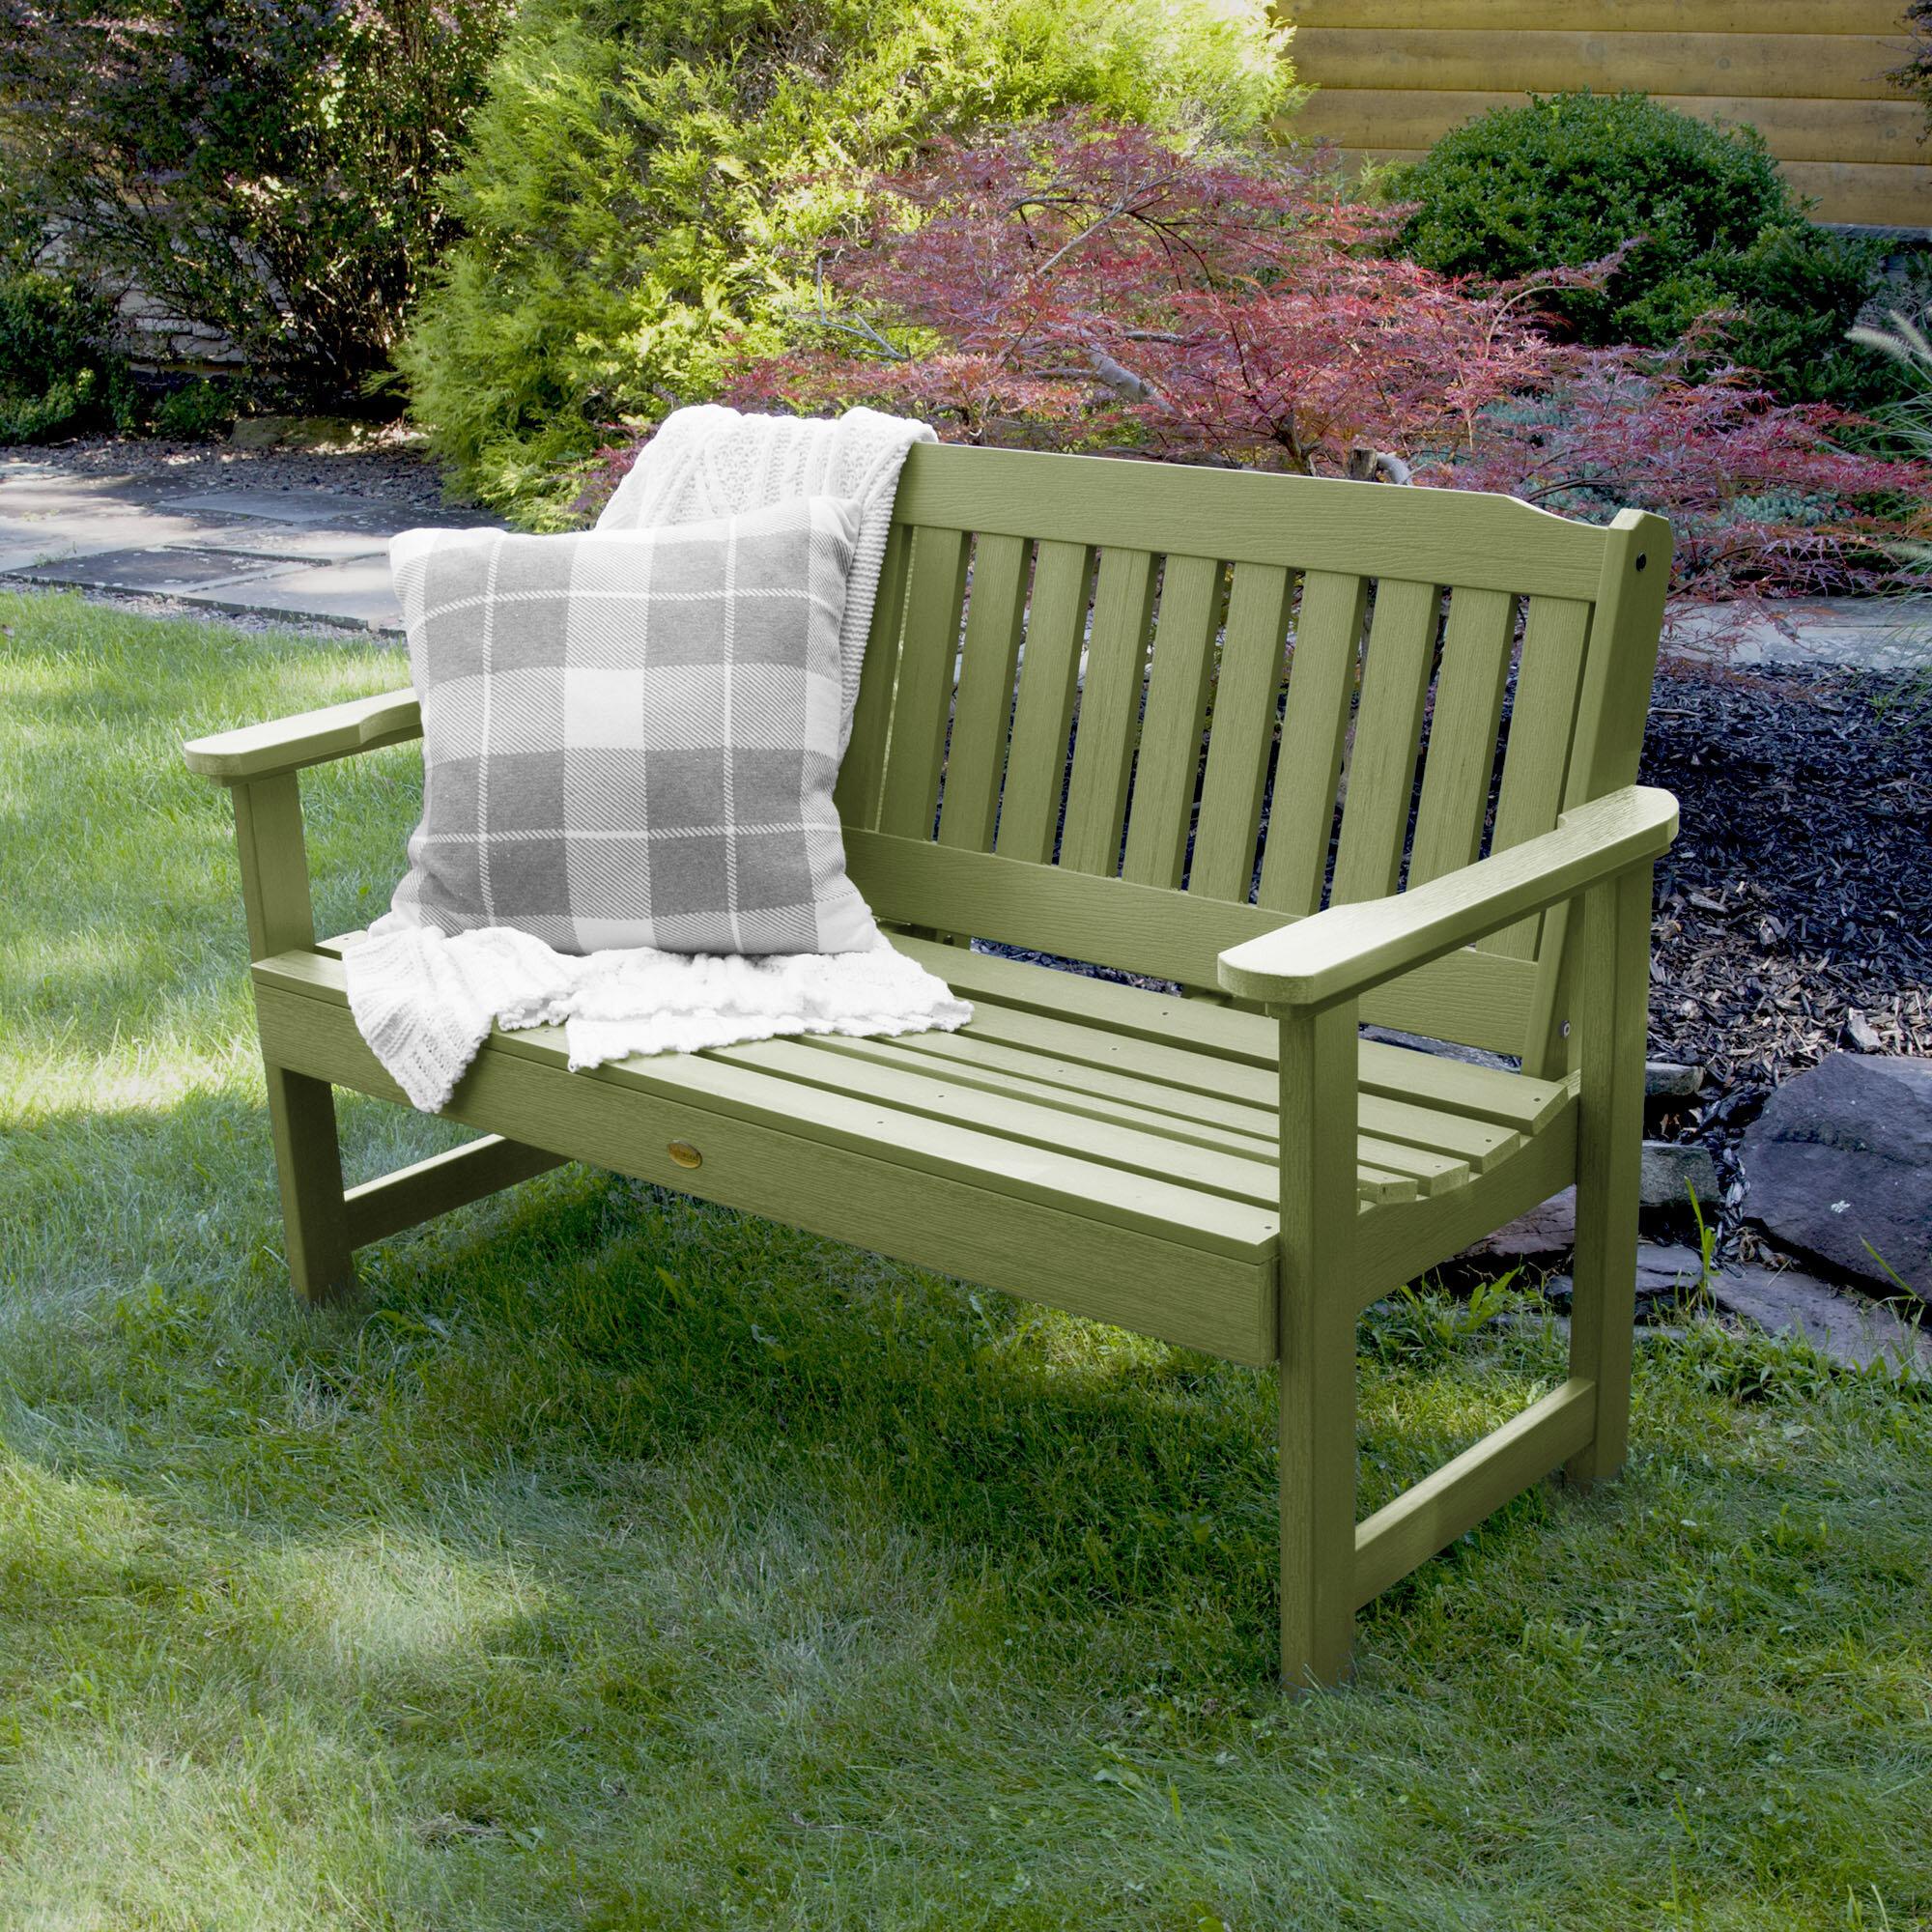 Amelia Plastic Garden Bench & Reviews | Birch Lane Within Leora Wooden Garden Benches (View 18 of 25)